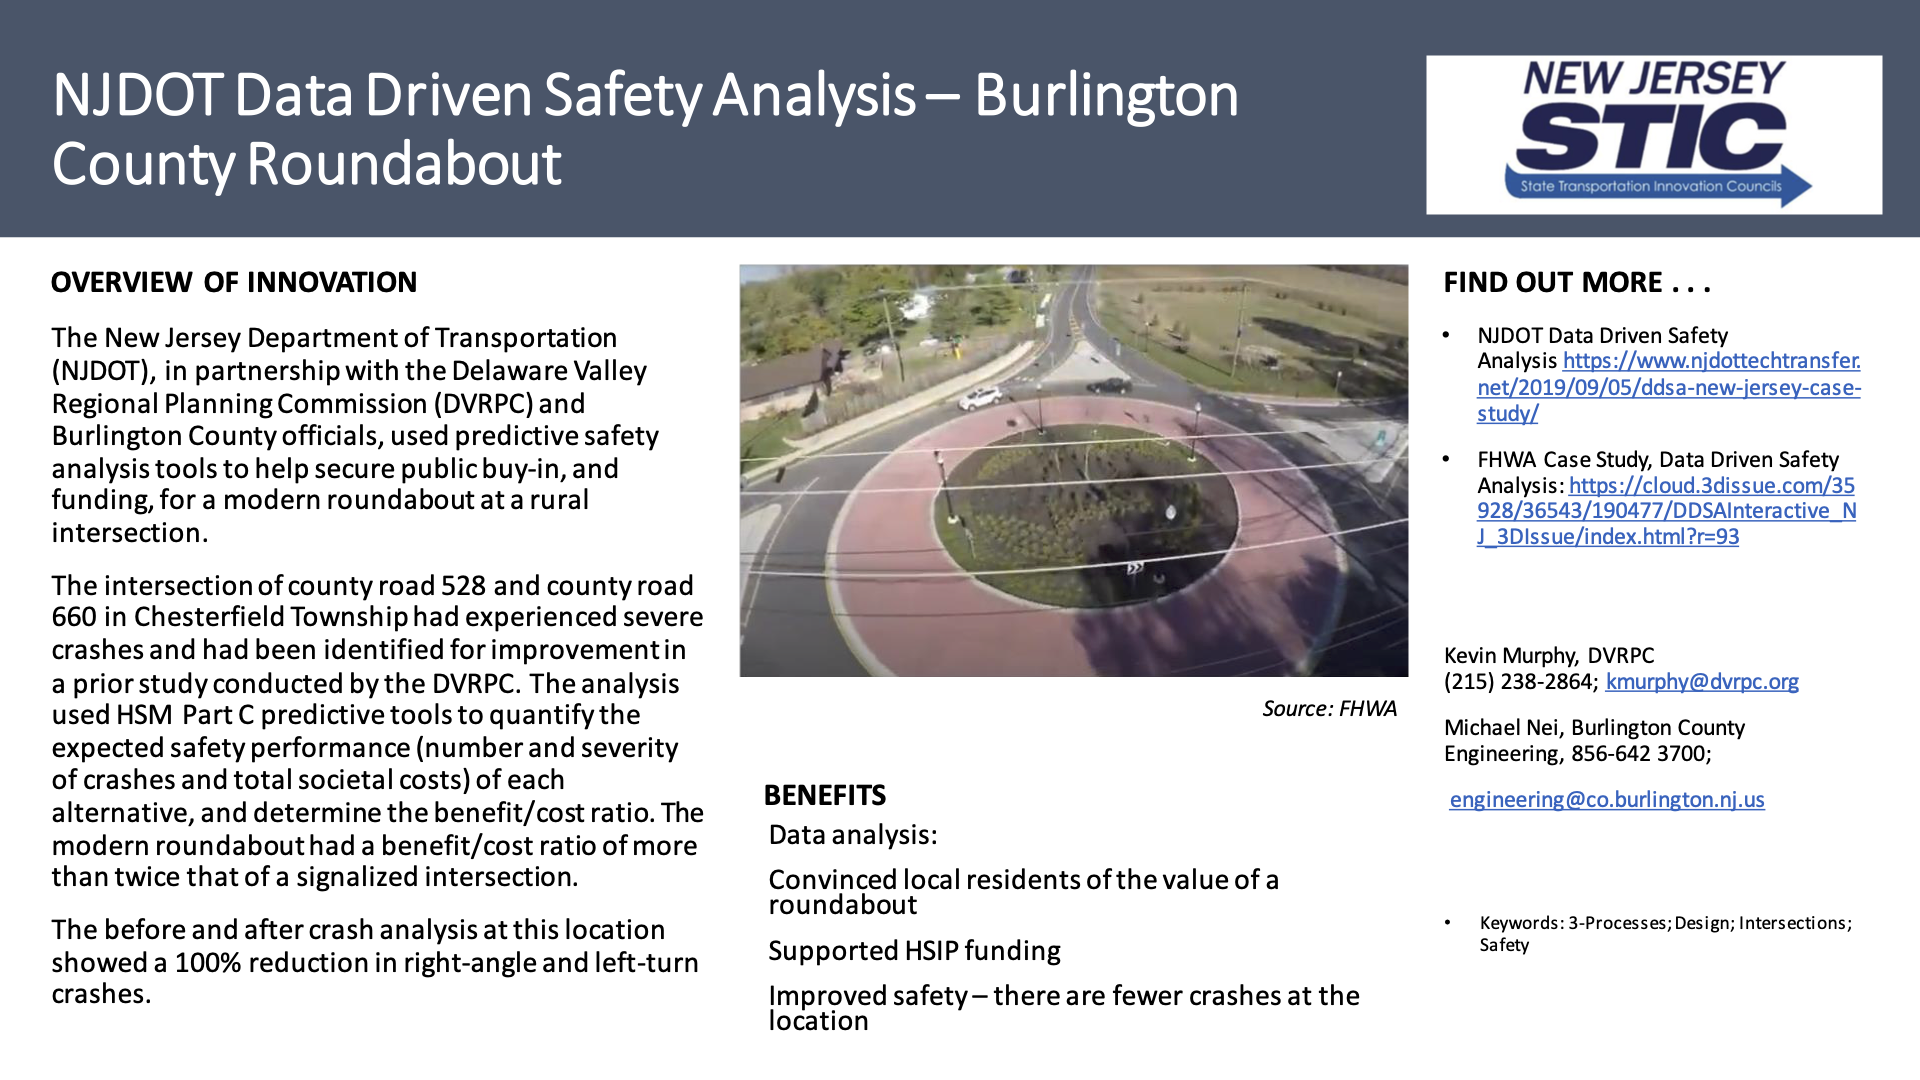 DDSA NJDOT Data Driven Safety Analysis – Burlington County Roundabout